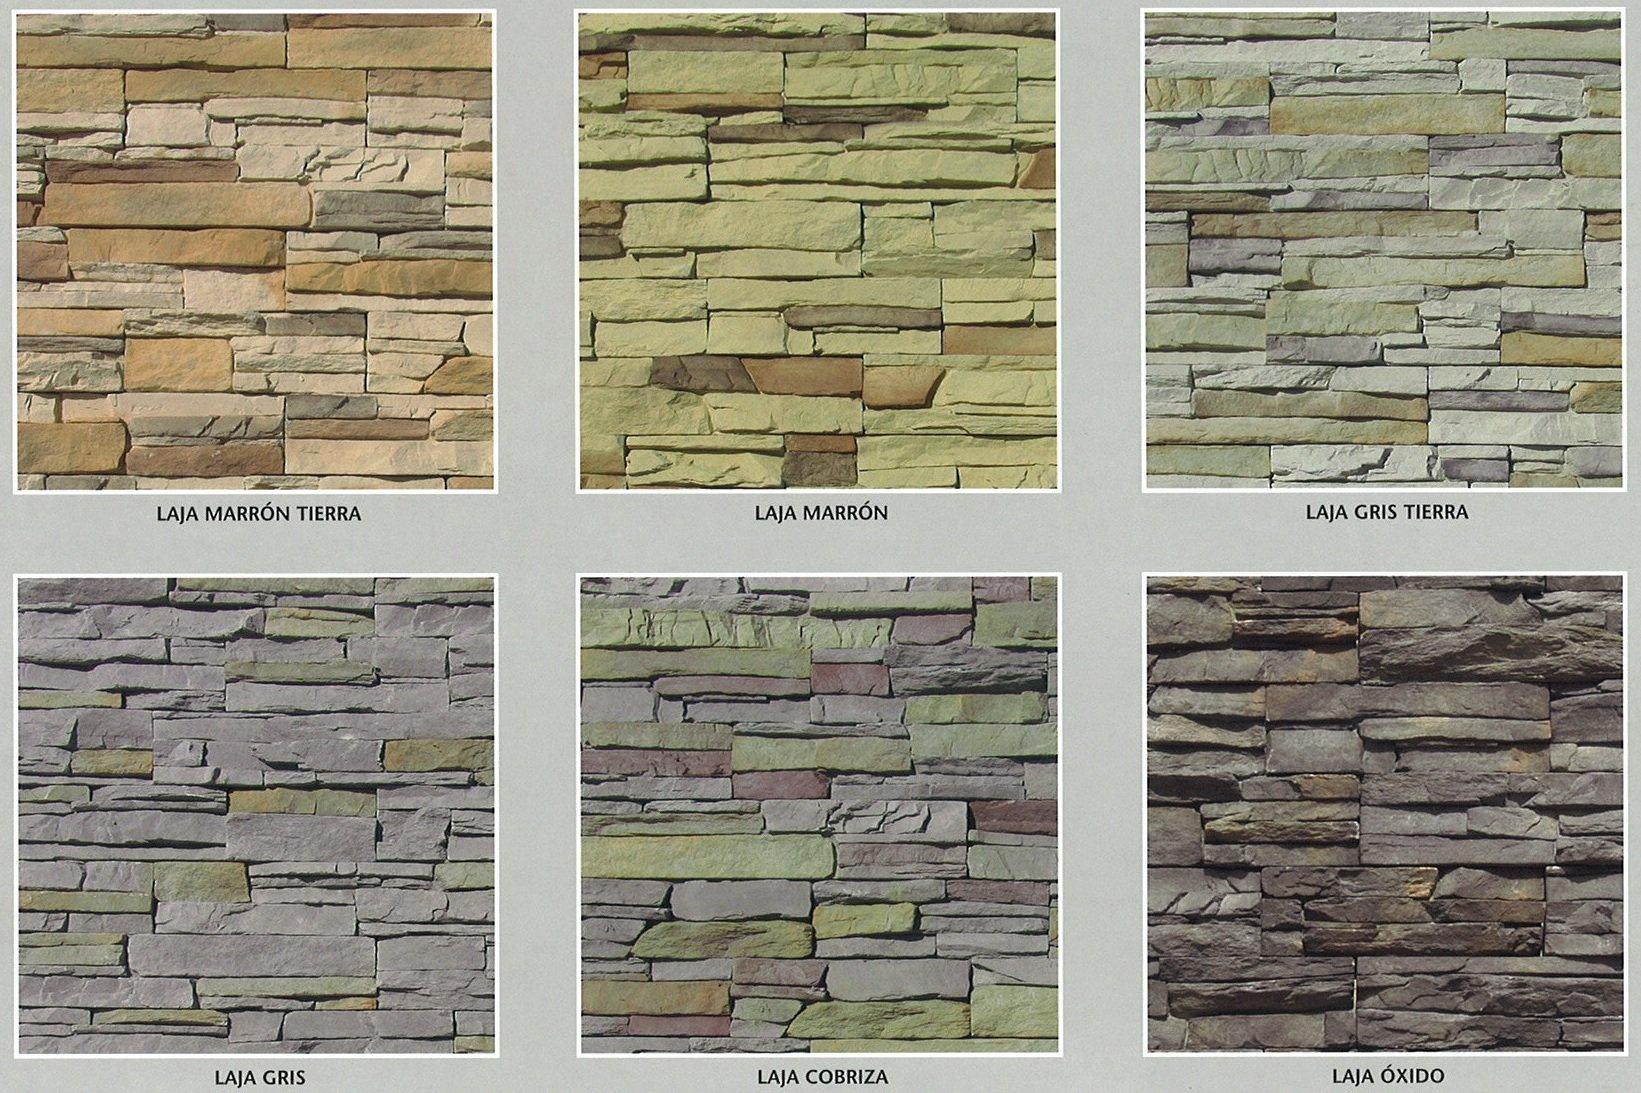 Piedra cultivada modelo laja cemat gijon asturias madrid zaragoza oferta precios baratos economicos - Precio de piedra para fachada ...